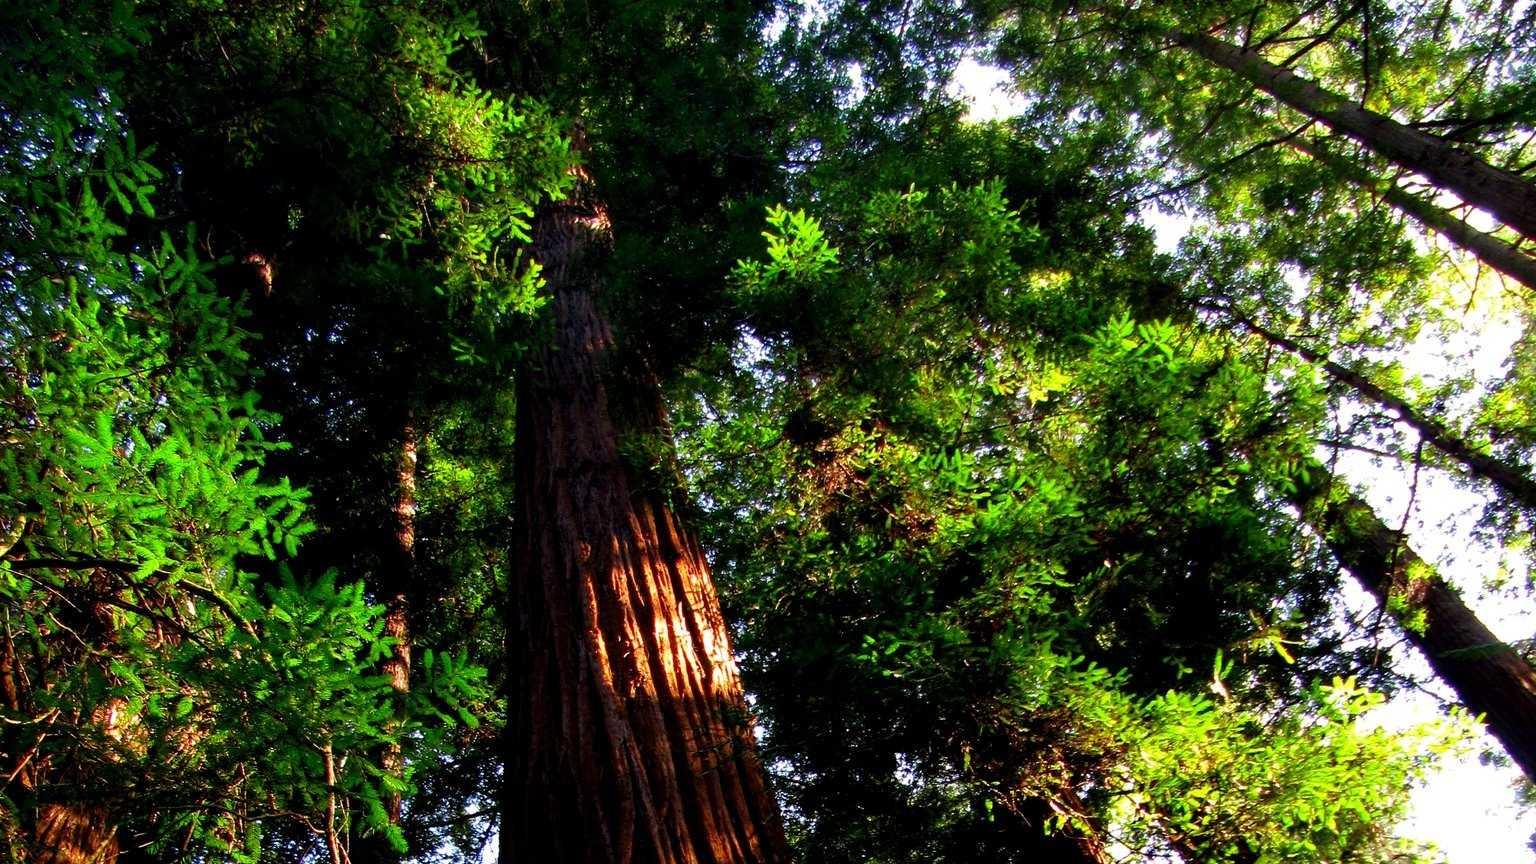 redwoodsbigestdec3.jpg